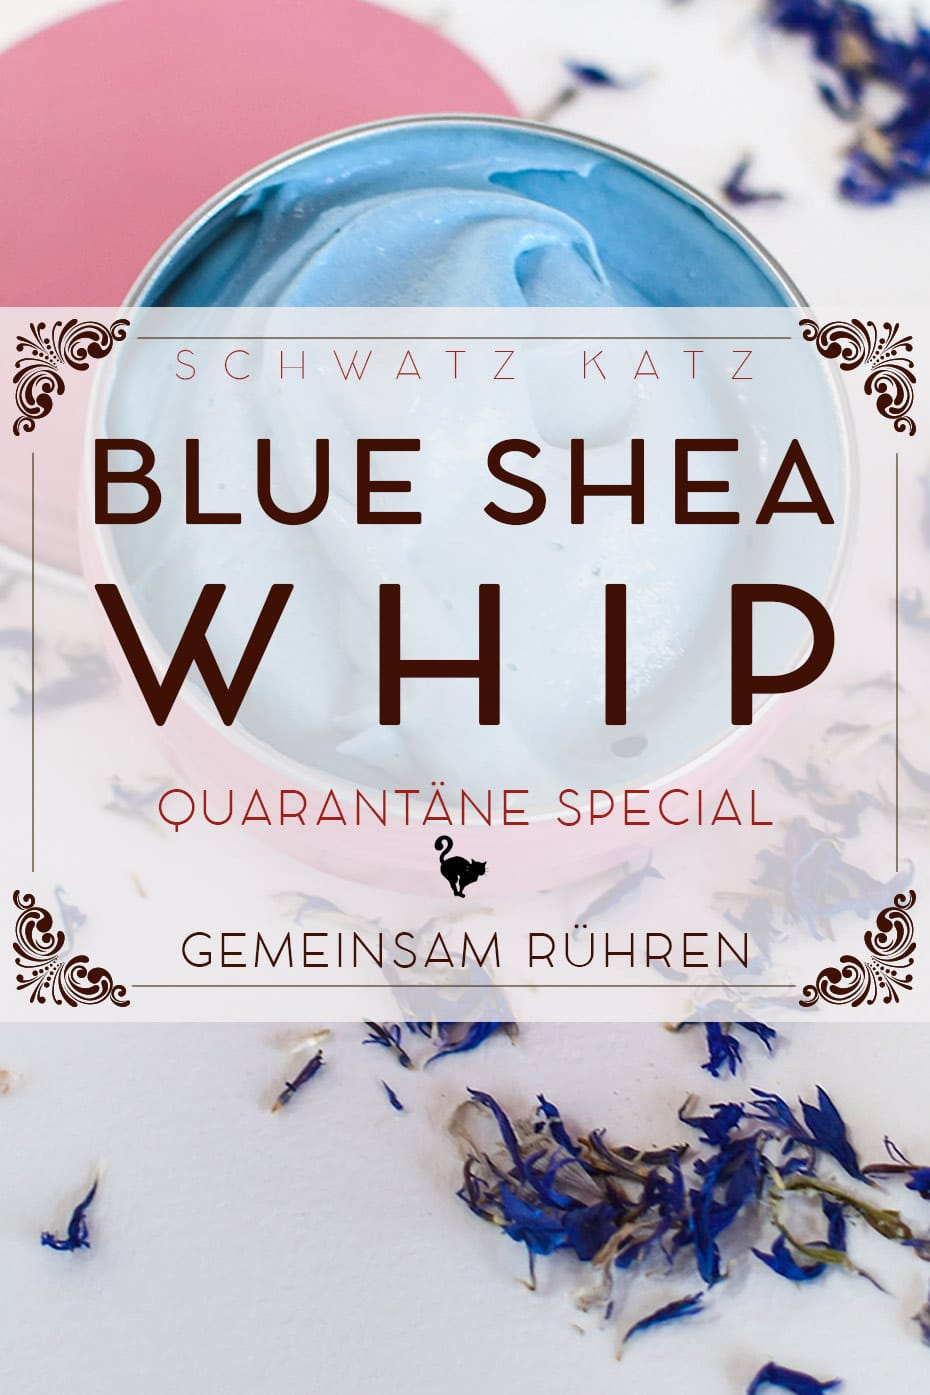 Schwatz Katz Quarantäne Special [SKQB]: Blue Shea Whip | Schwatz Katz